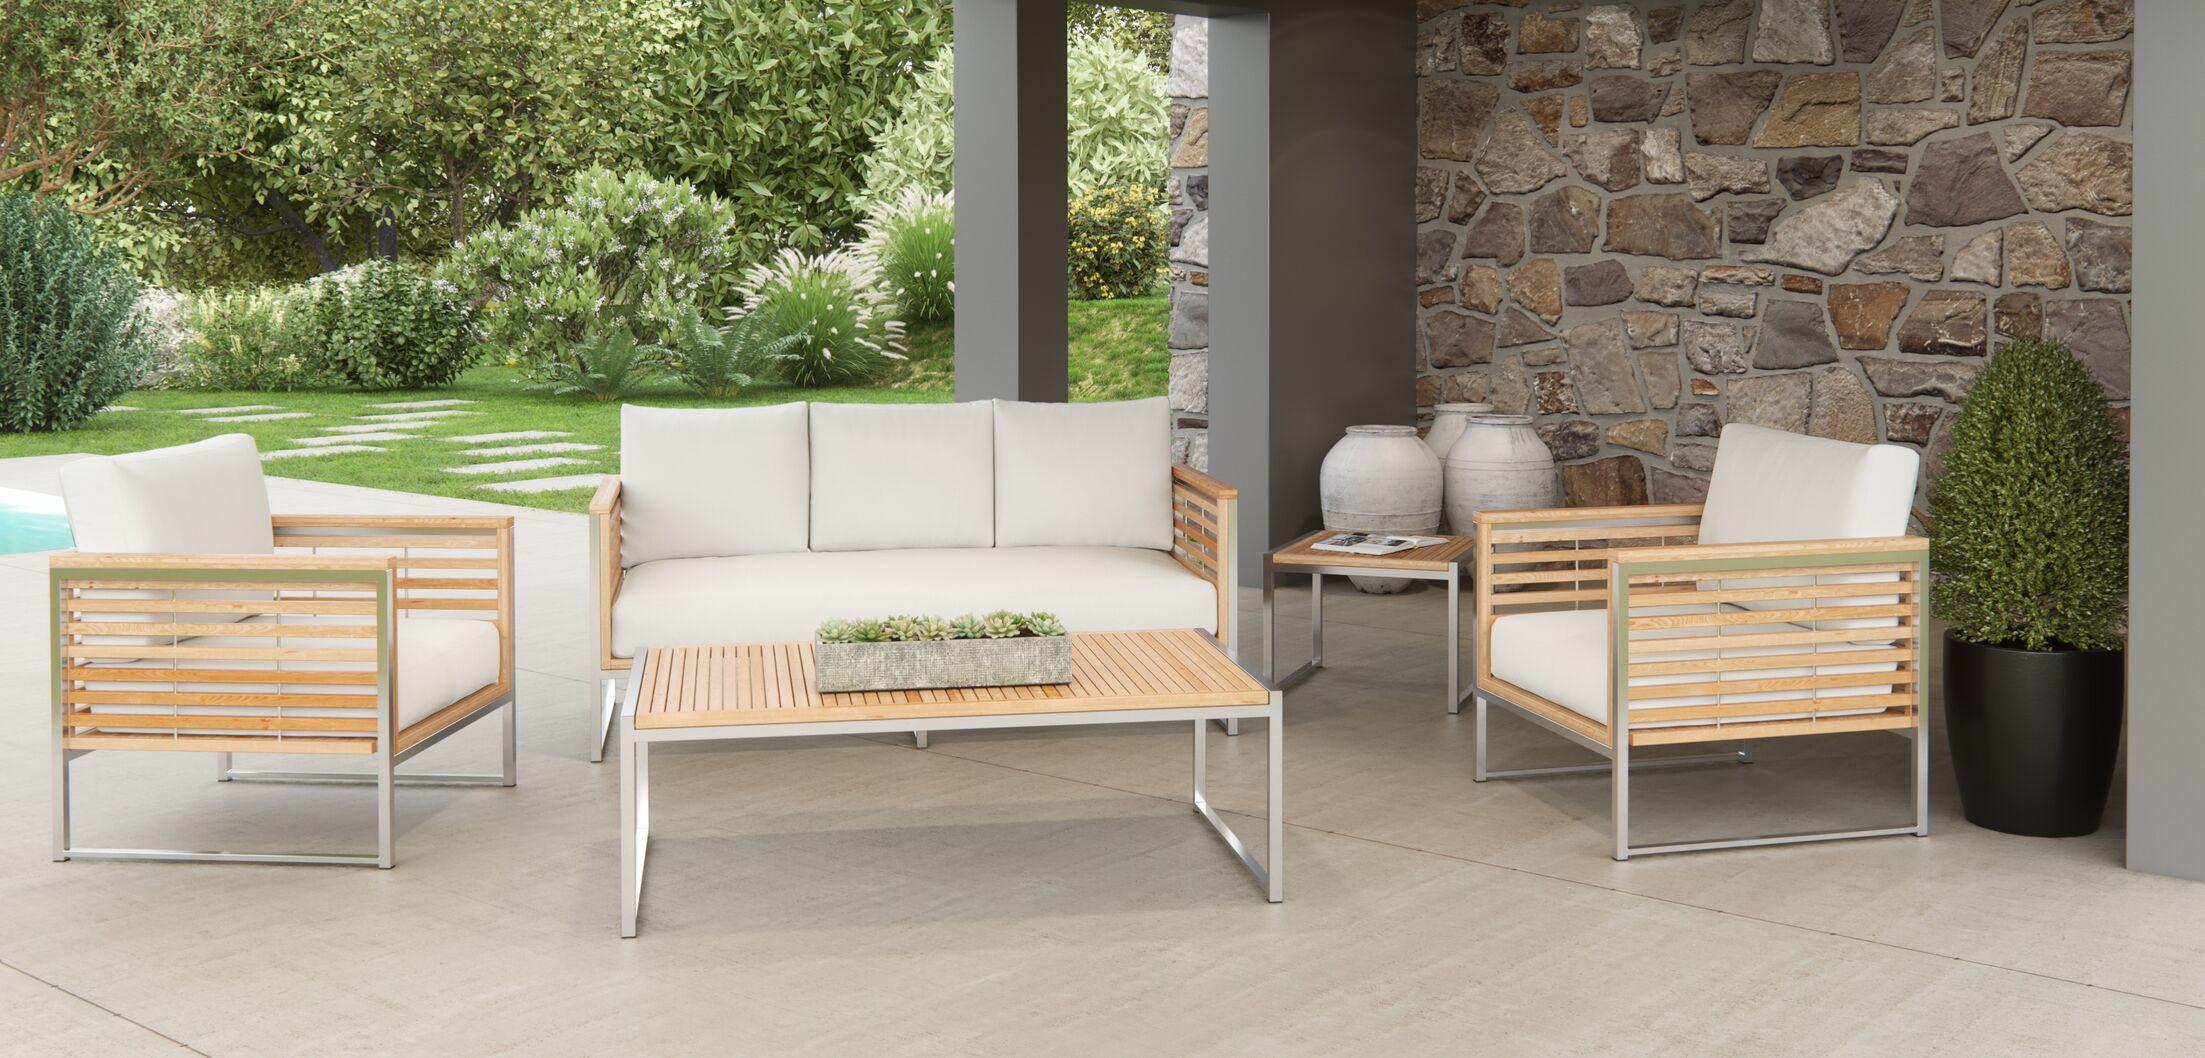 Markowitz 5 Piece Teak Sofa Set with Cushions